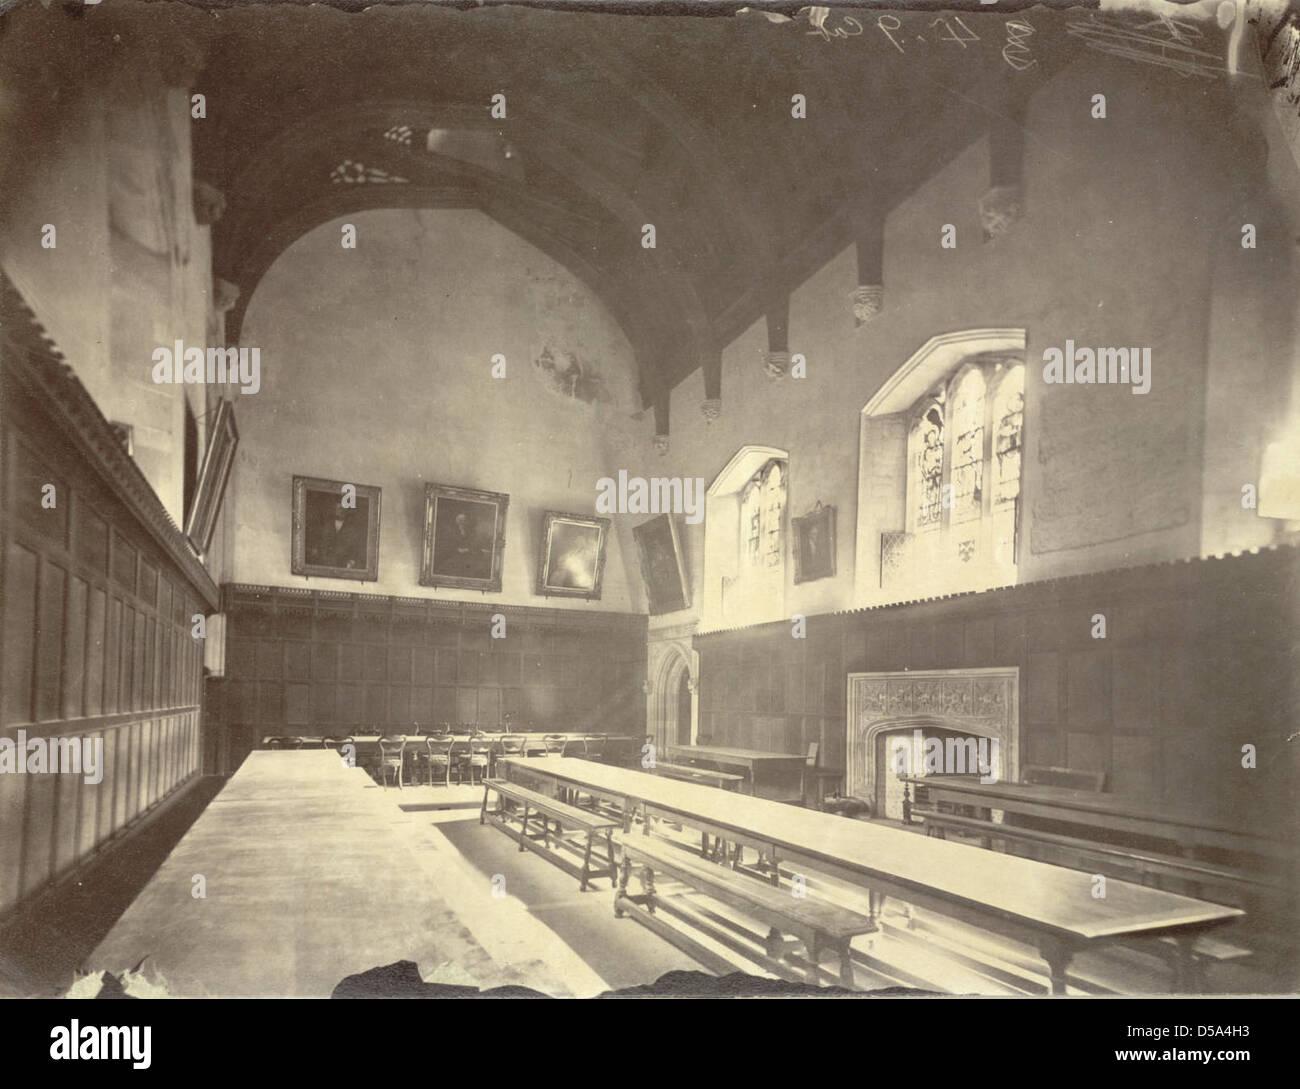 Cambridge. Peterhouse, Dining Hall (Interior, Before Redecorations) - Stock Image